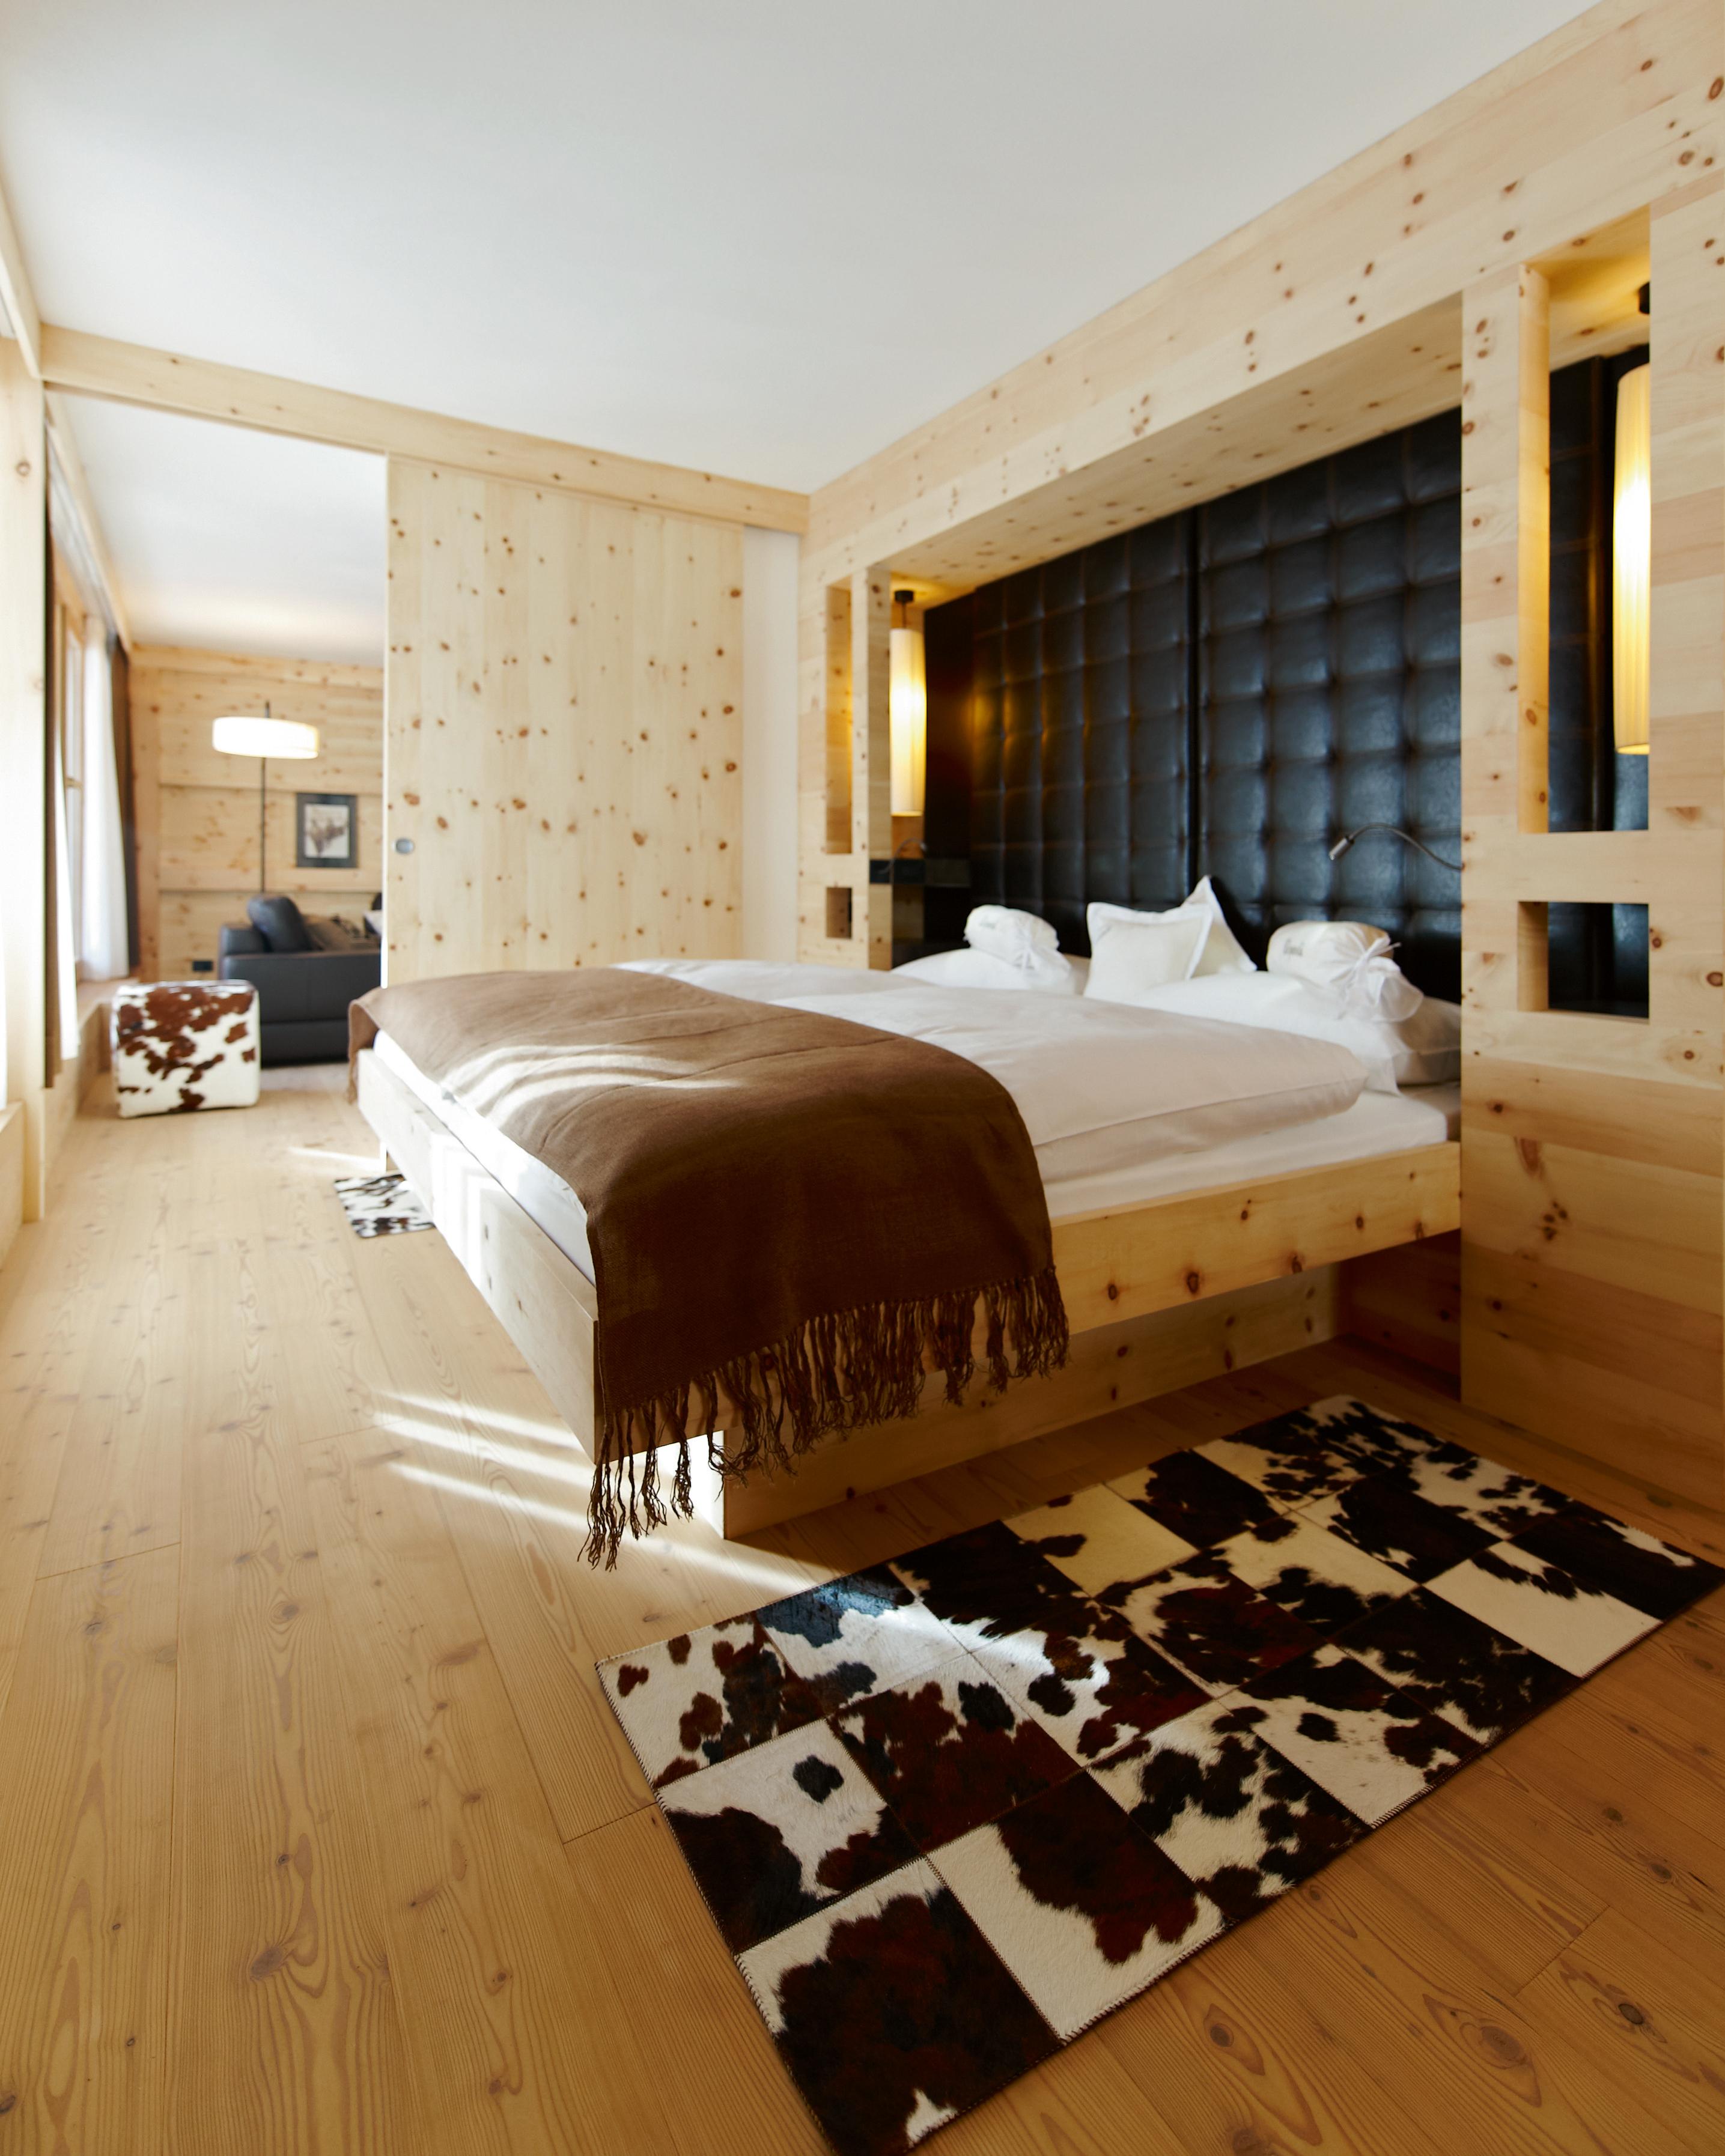 affordable-hotels-italy-10-lagacio--mountain-residence-0814.jpg